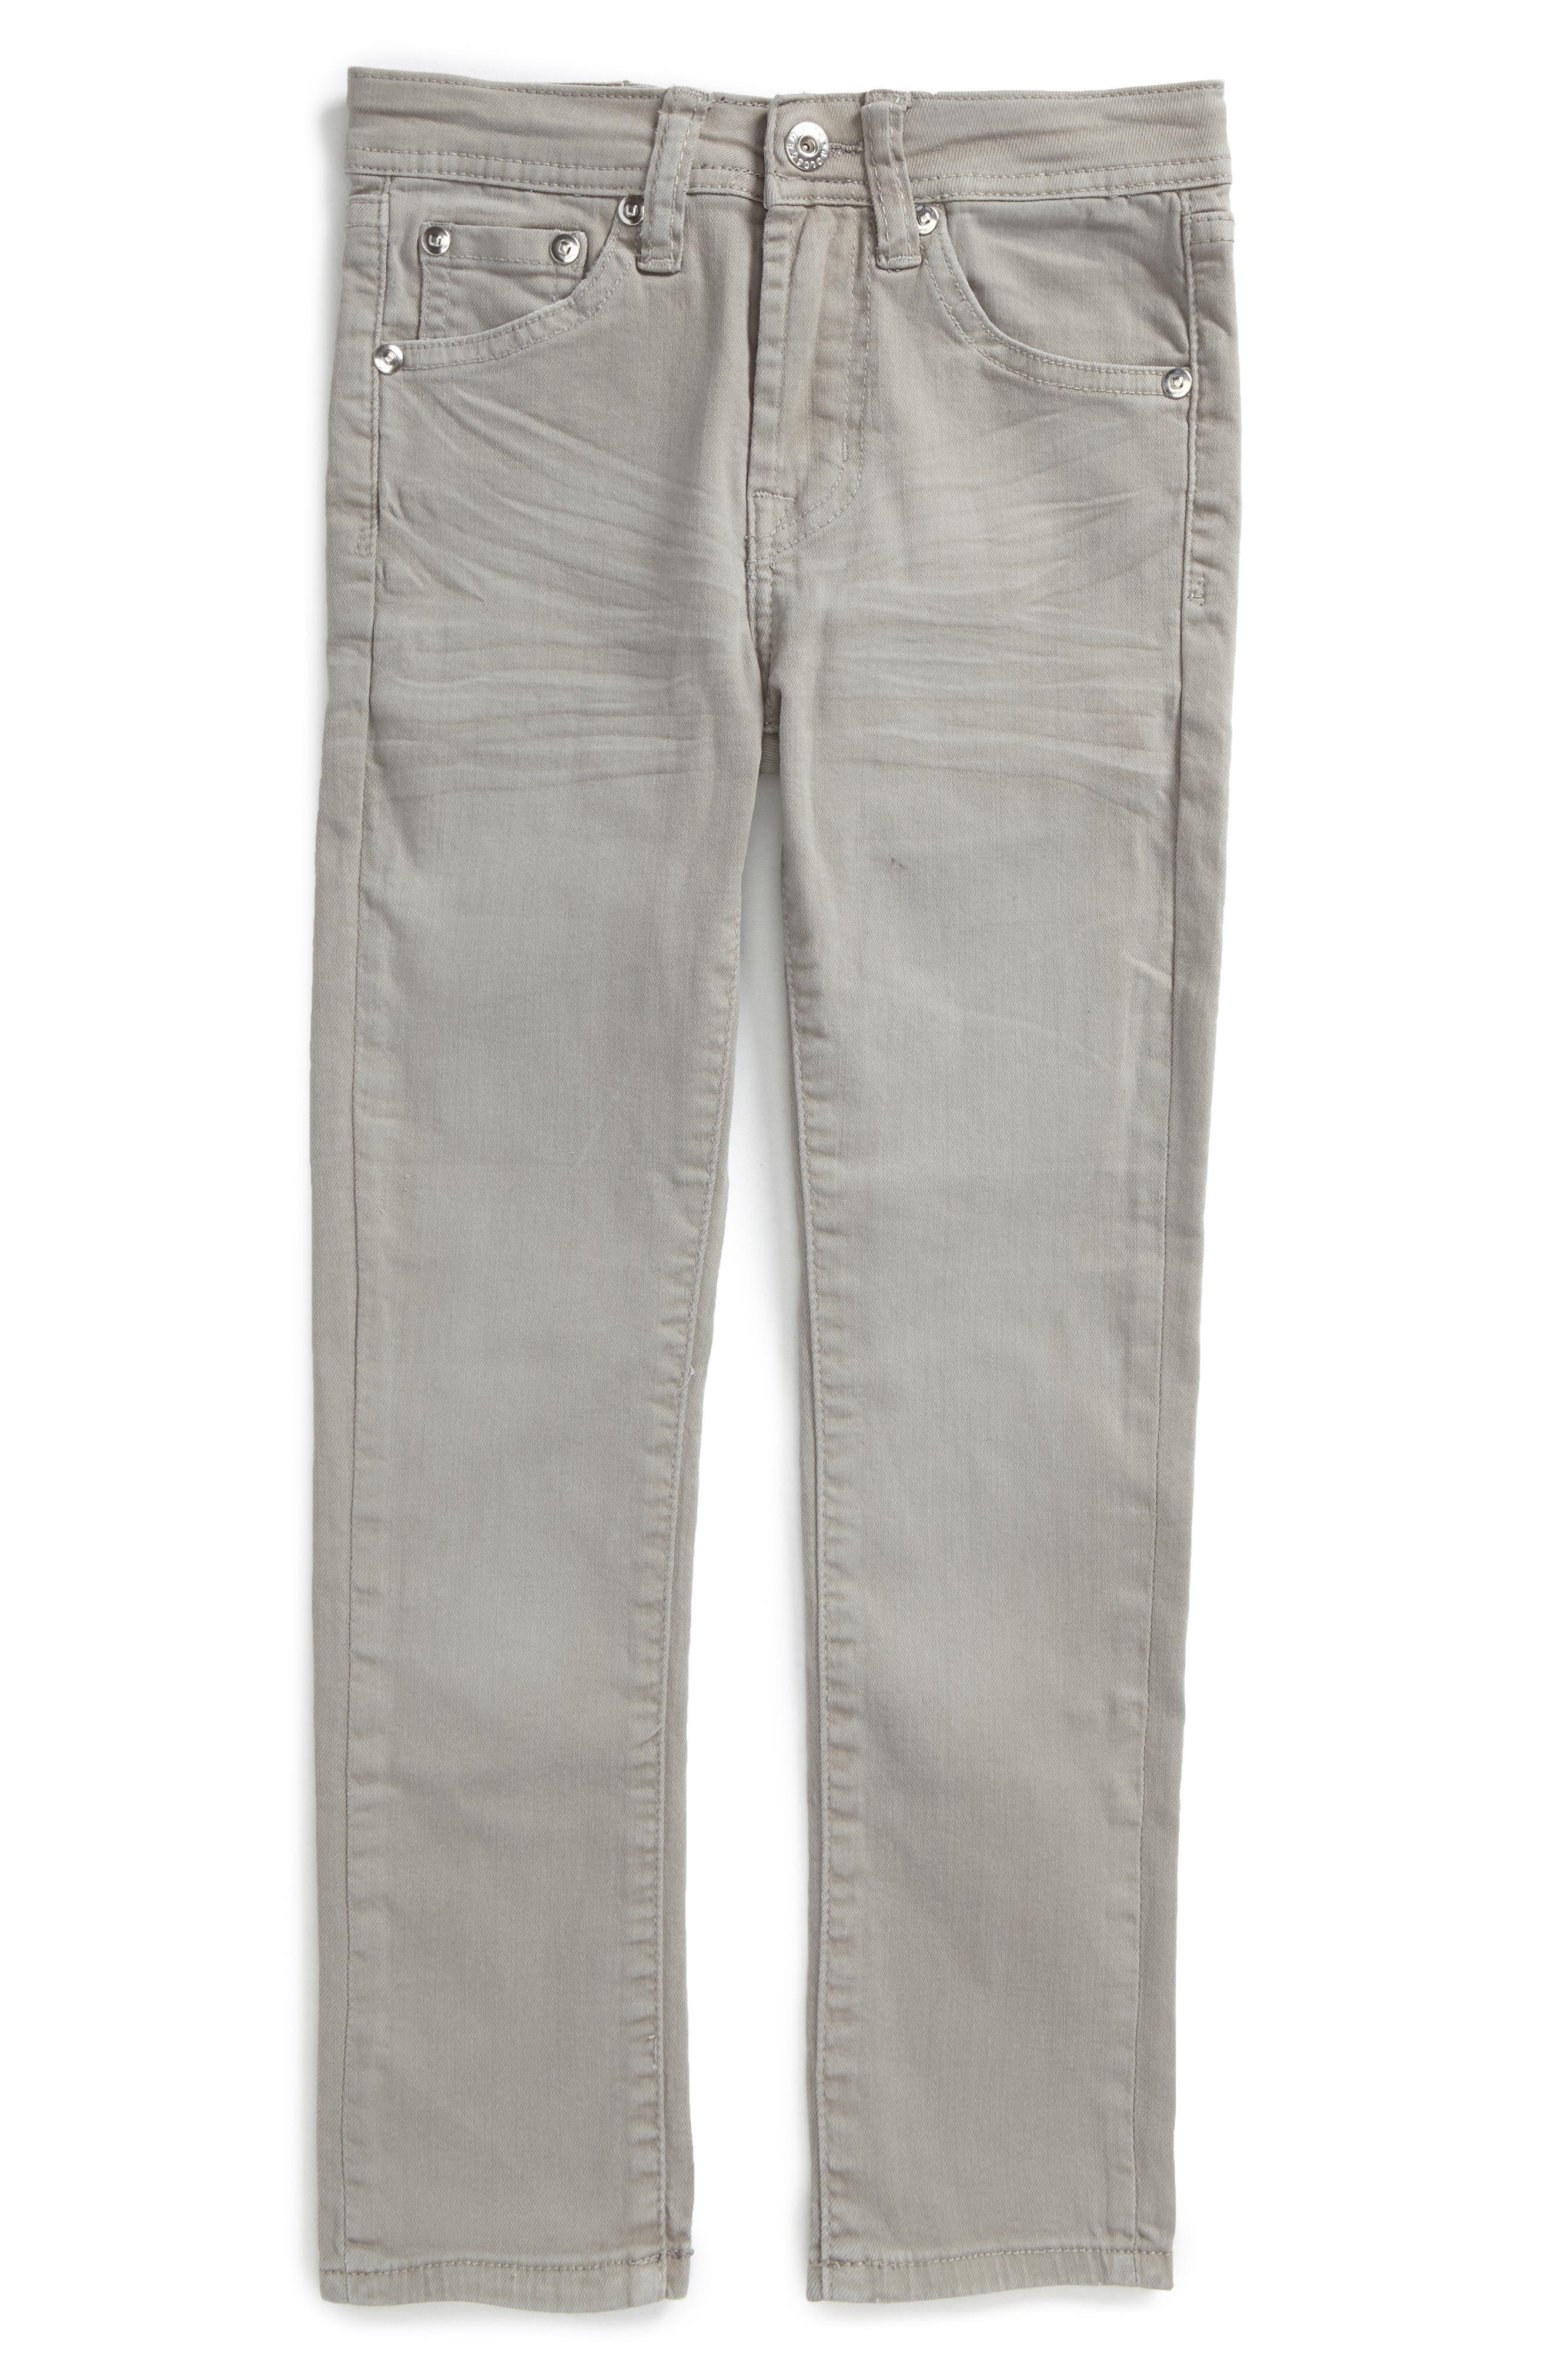 Main Image - ag adriano goldschmied kids The Ryker Slim Skinny Jeans (Little Boys)